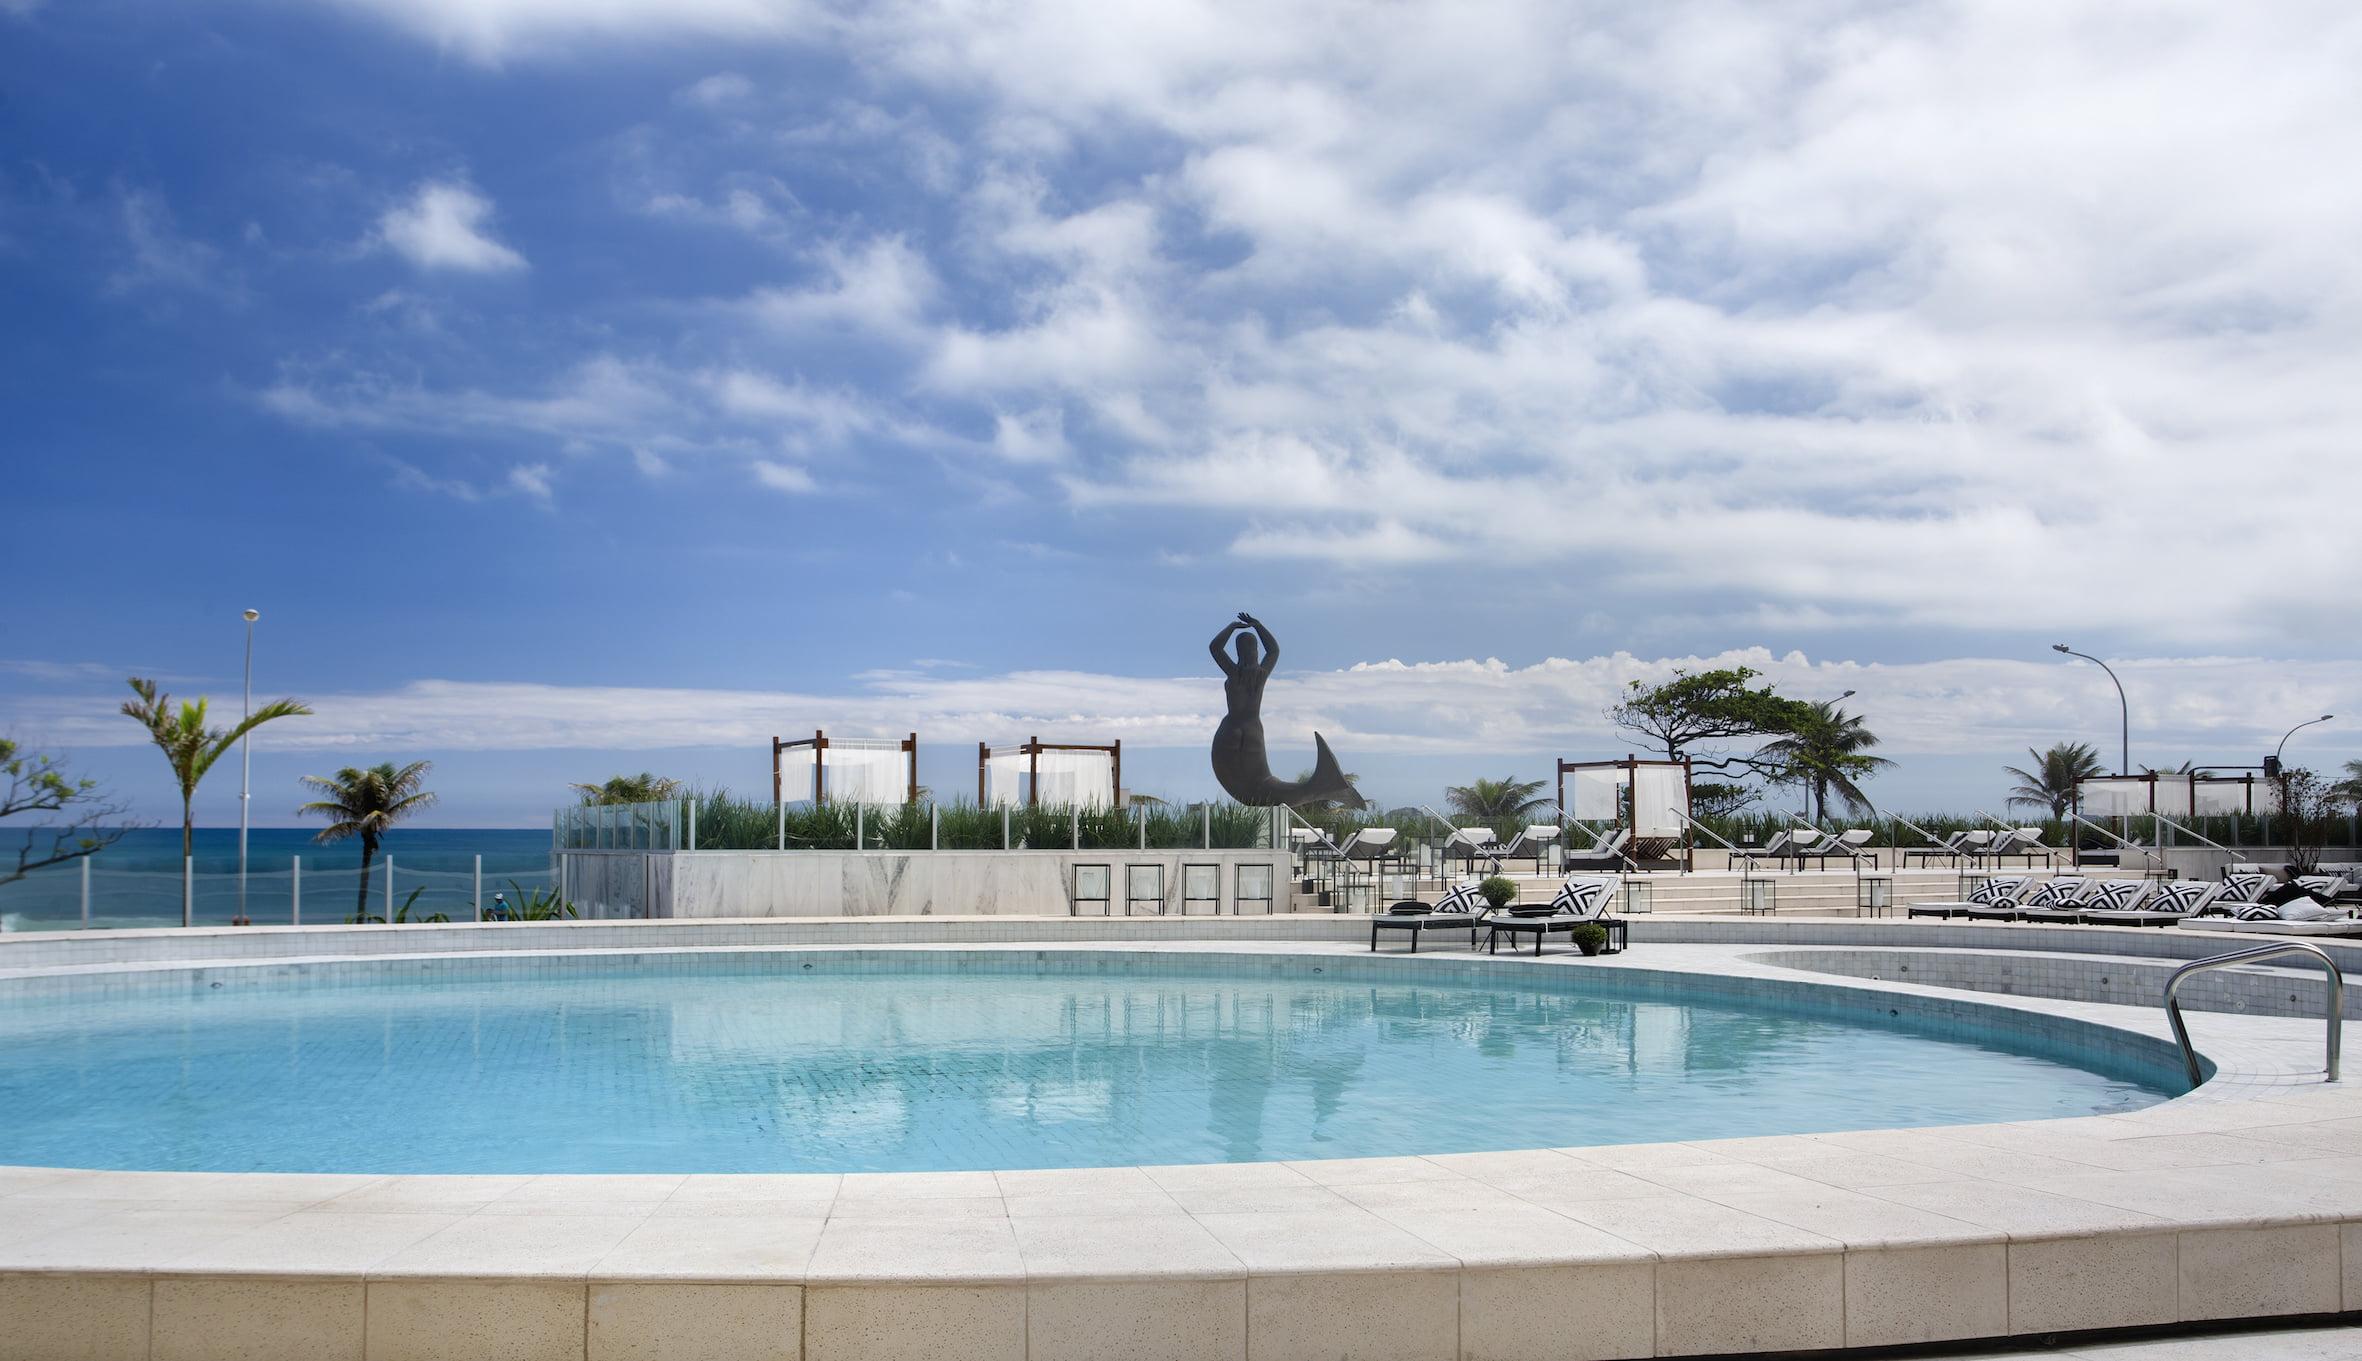 O Gran Meliá Nacional Rio de Janeiro: day use nas piscinas dos hotéis cariocas